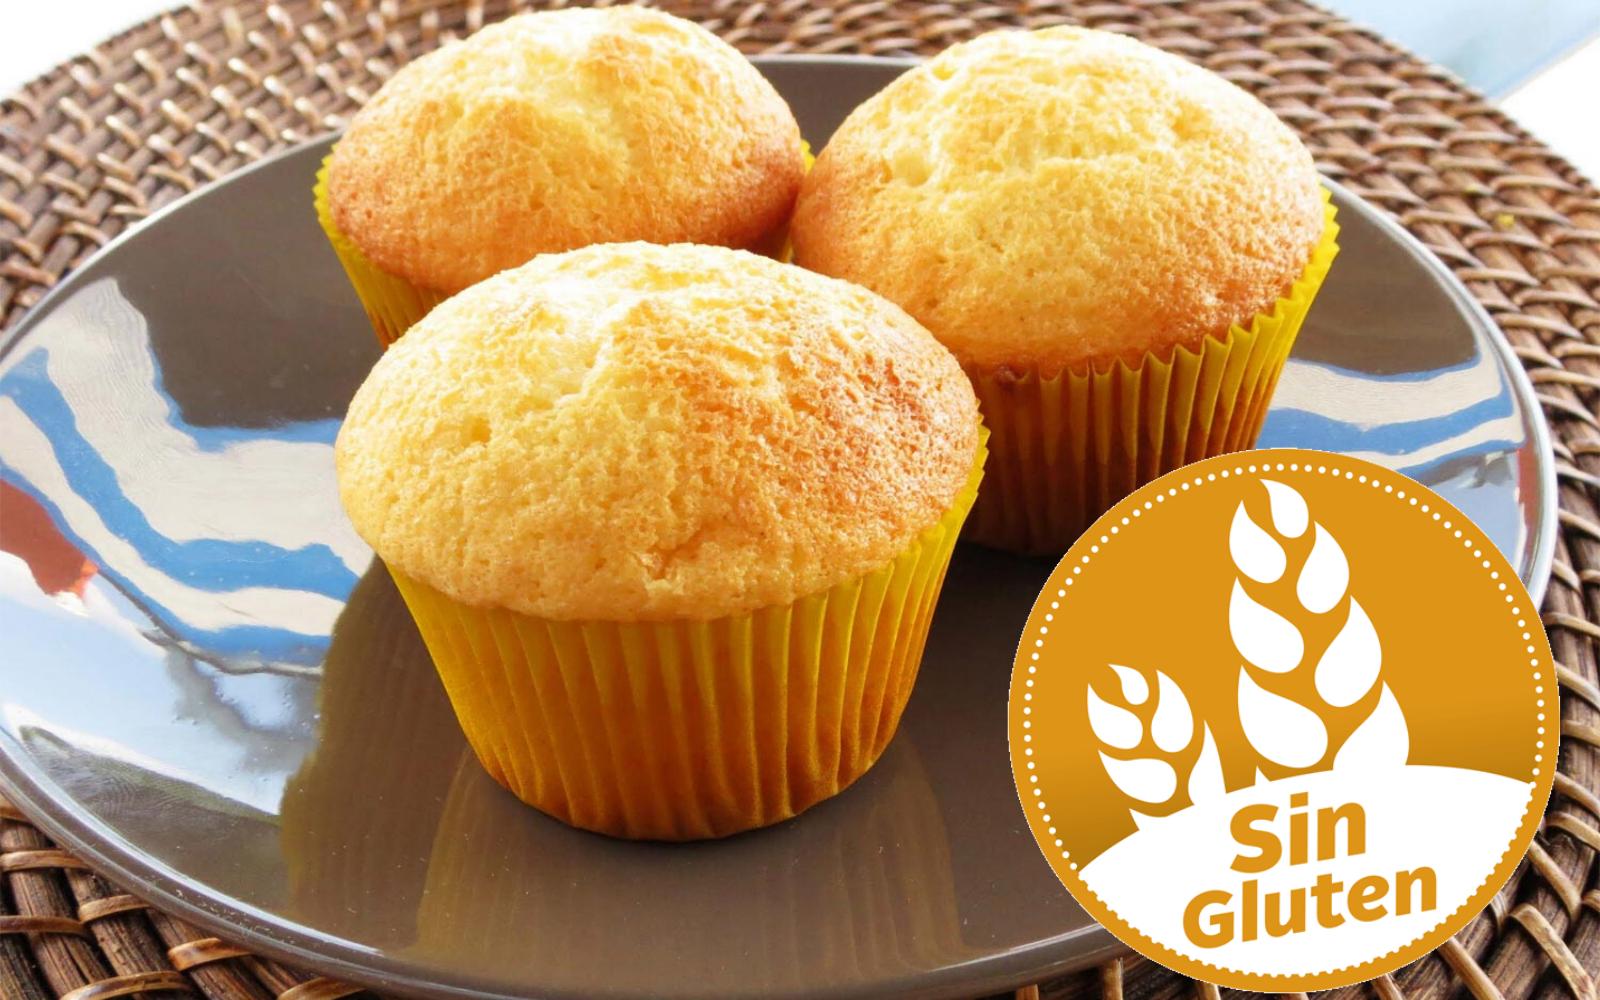 Recetas De Muffins O Magdalenas Sin Gluten Caseras Para Celíacos Receta Magdalenas Caseras Magdalenas Caseras Recetas Magdalenas